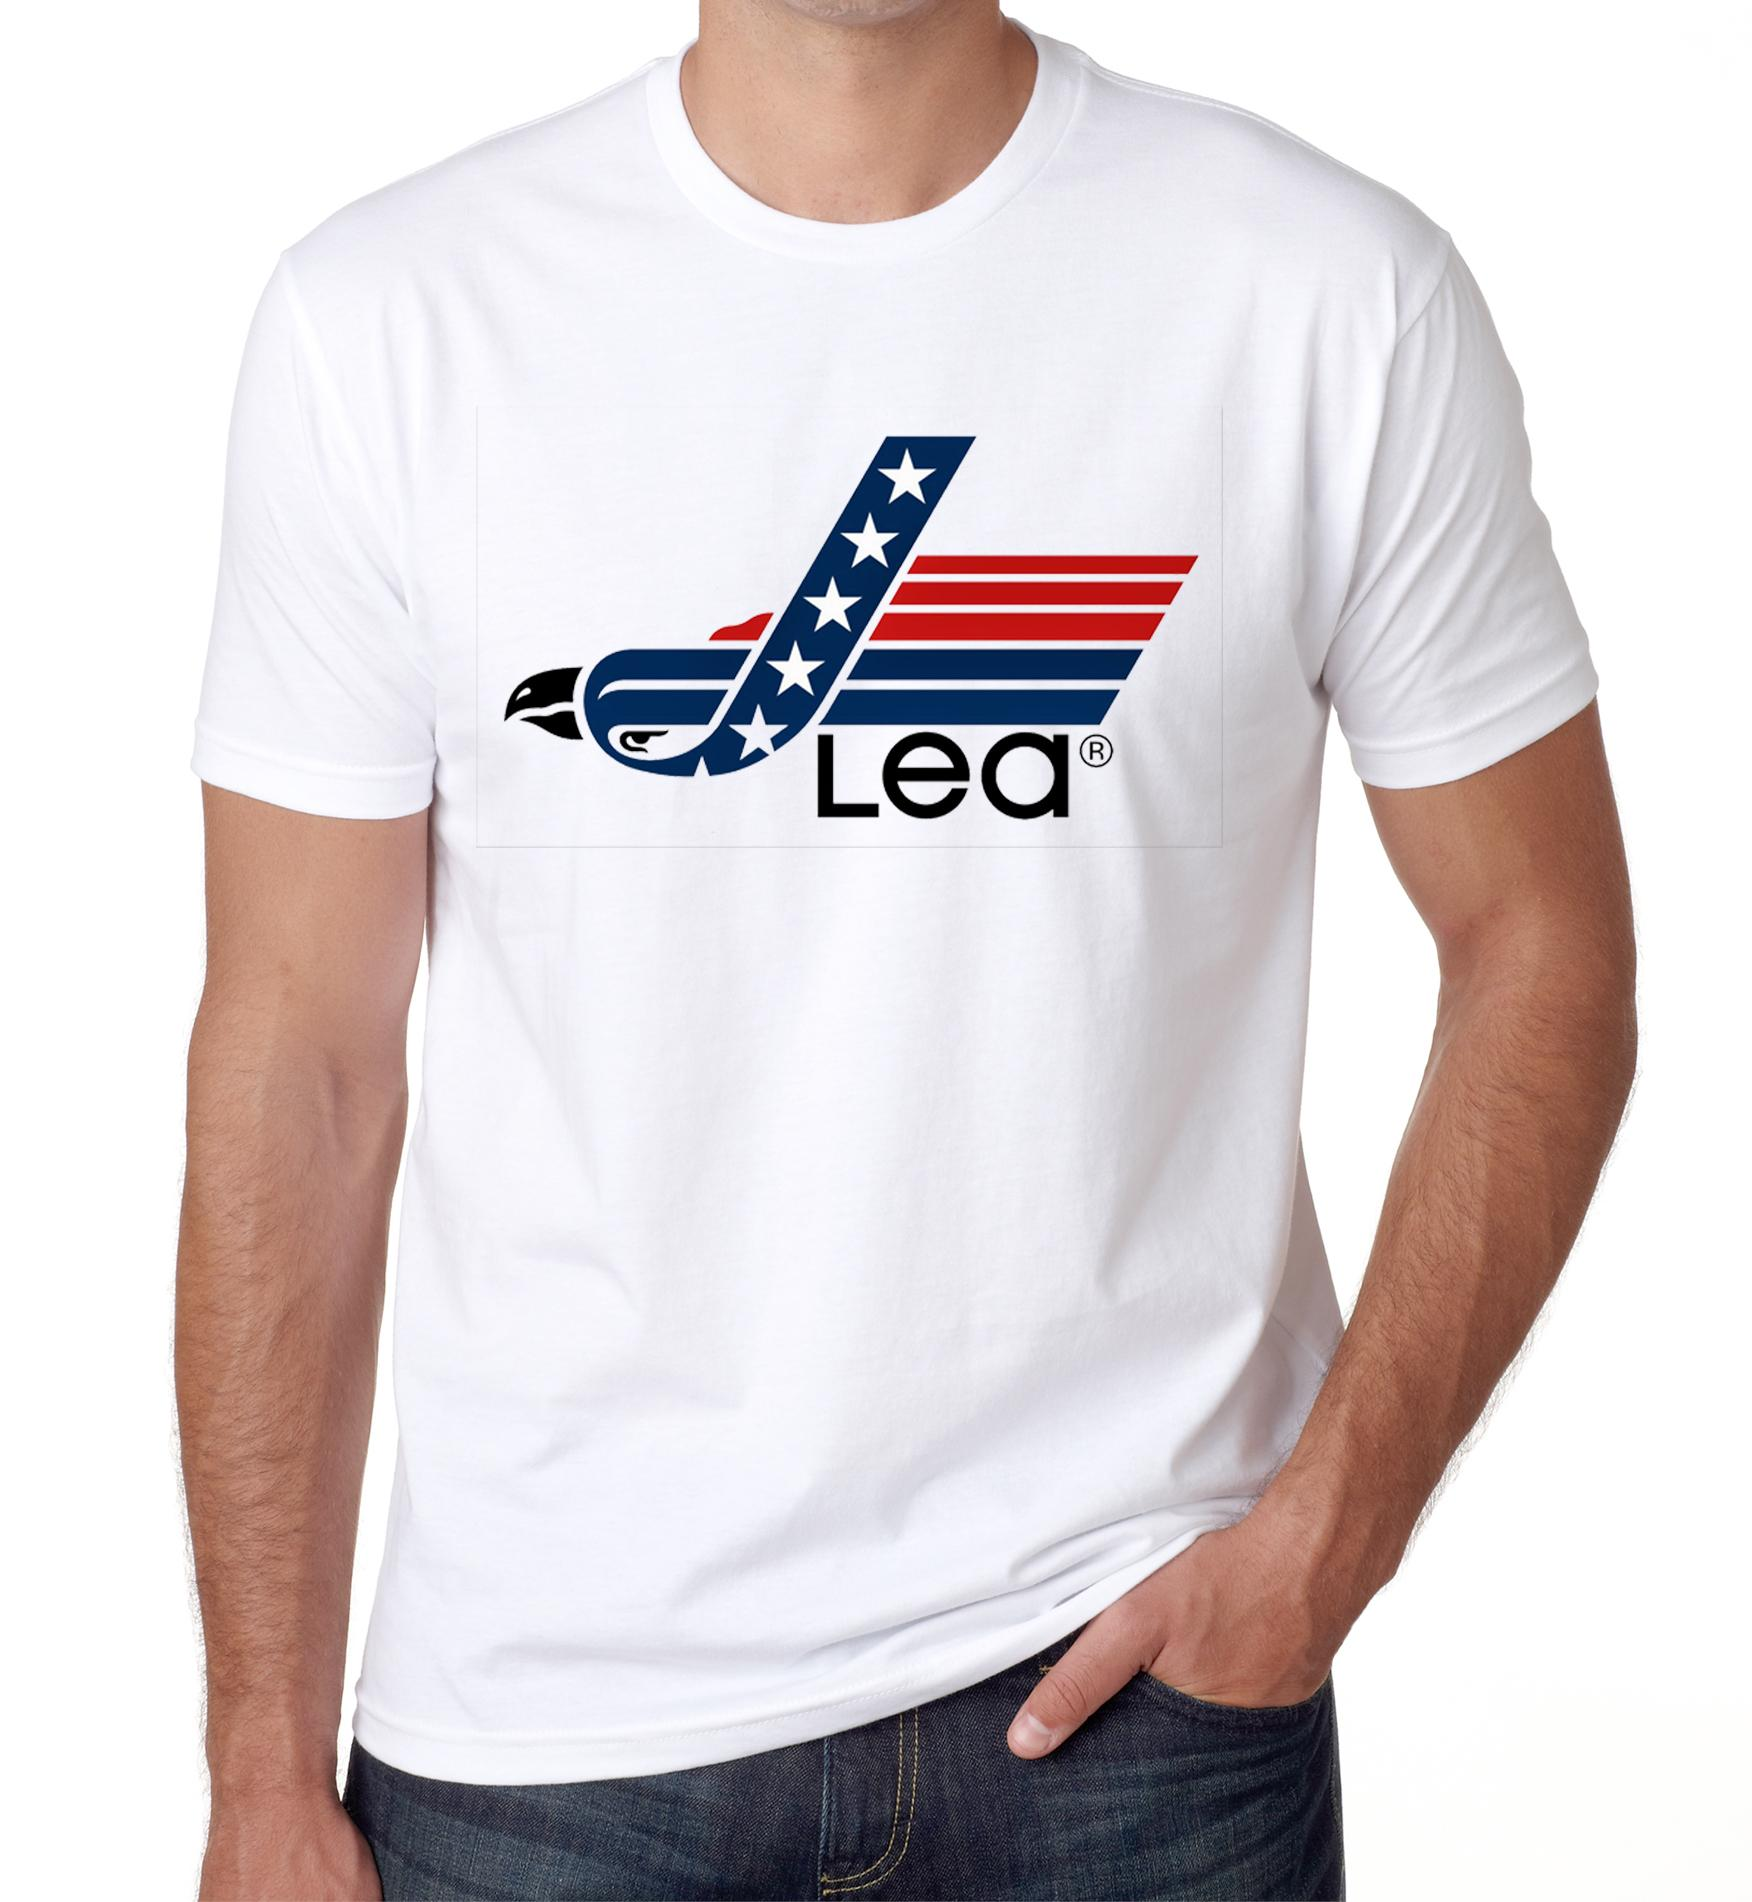 Baju Kaos T-Shirt Oblong Pria/Wanita distro